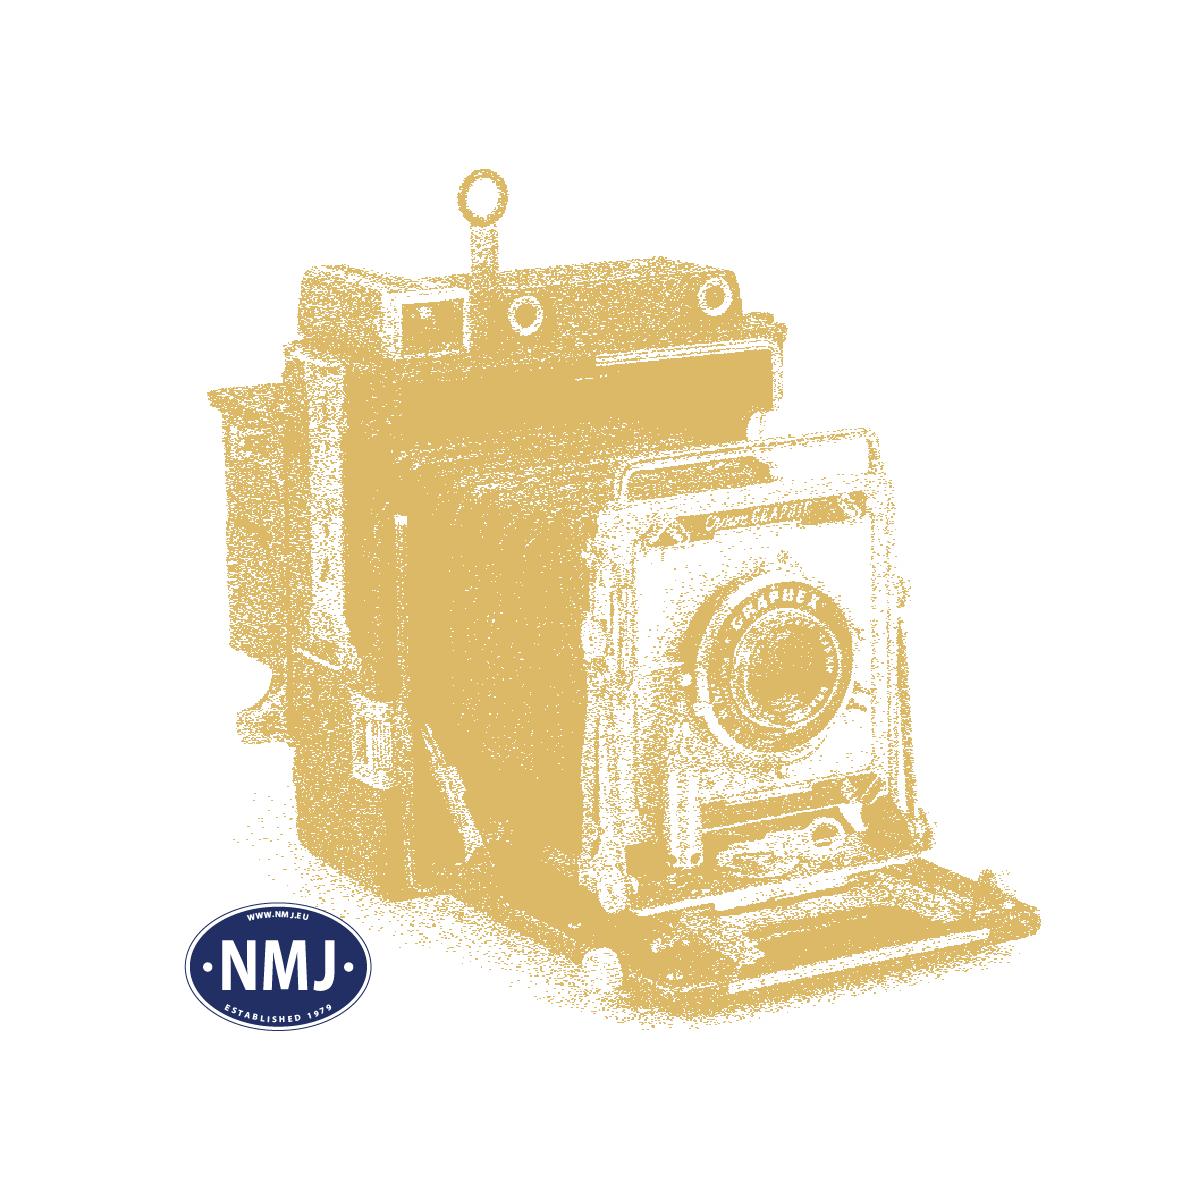 NMJ Topline MAV M61.005, AC Digital